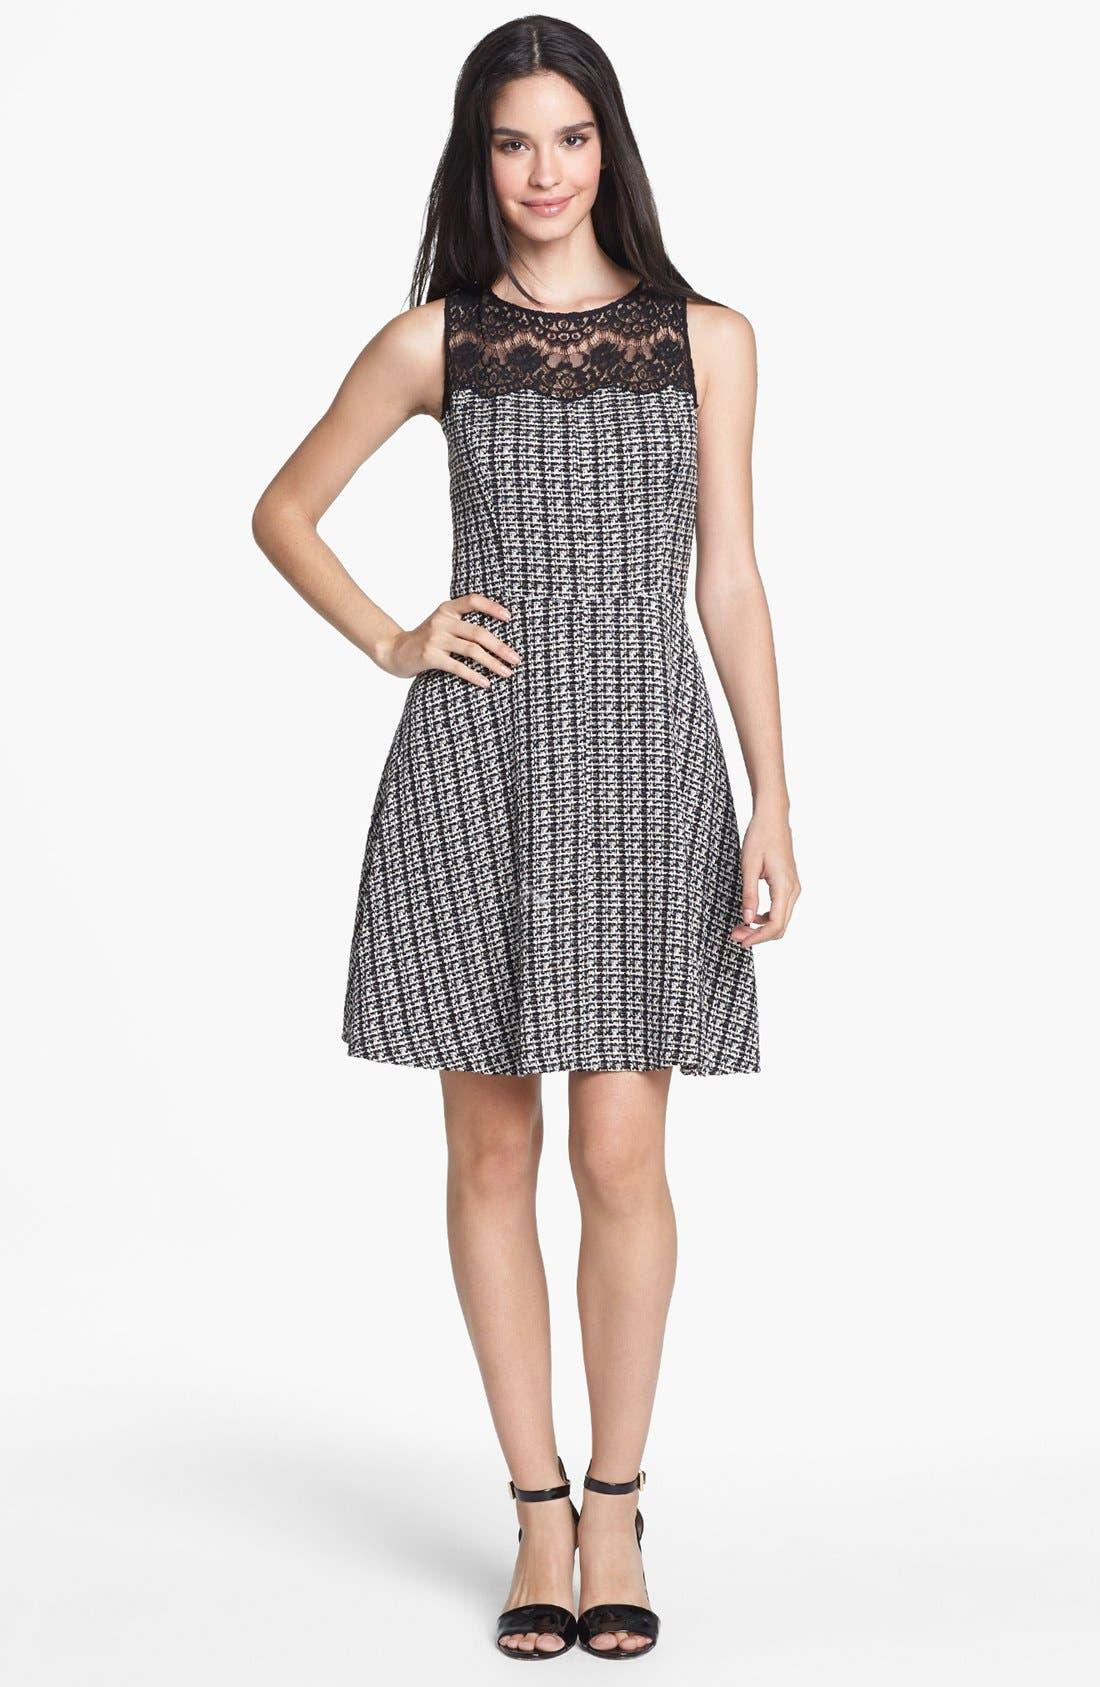 Main Image - Jessica Simpson Lace Yoke Bouclé Fit & Flare Dress